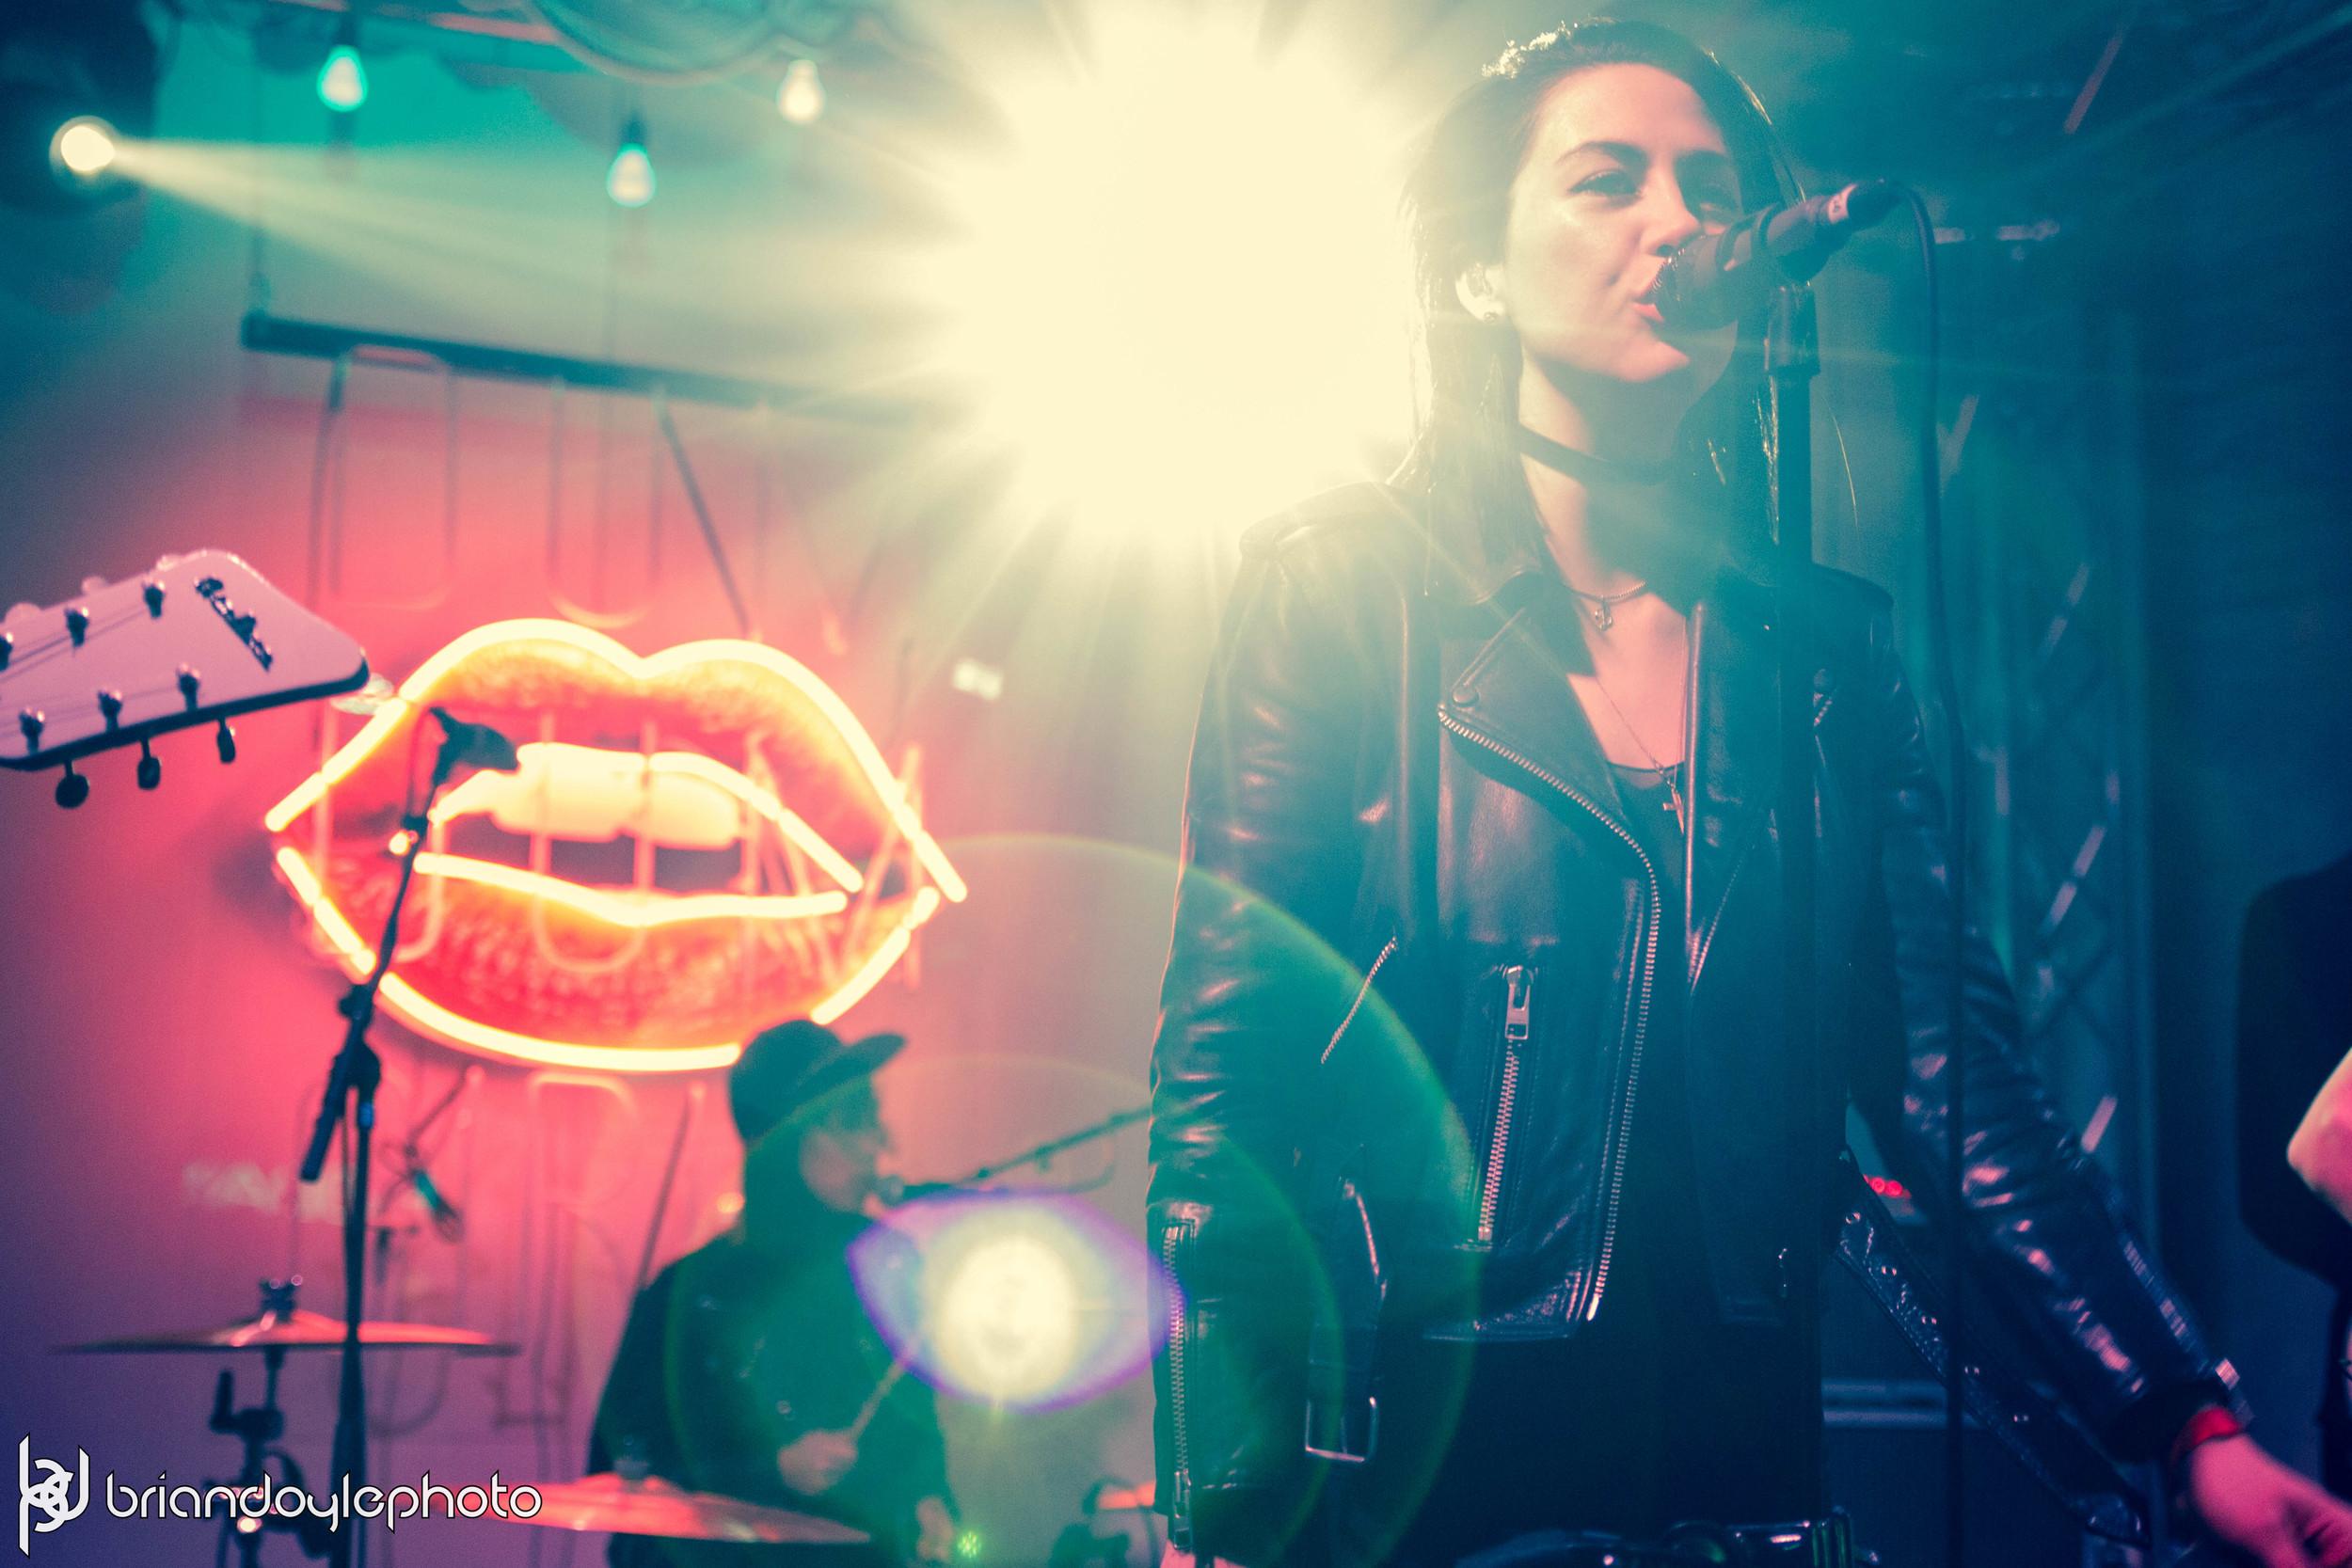 Red Bull - Dum Dum Girls, Tropicana and the Flea, Lowell @ The Well 2014.11.16-49.jpg